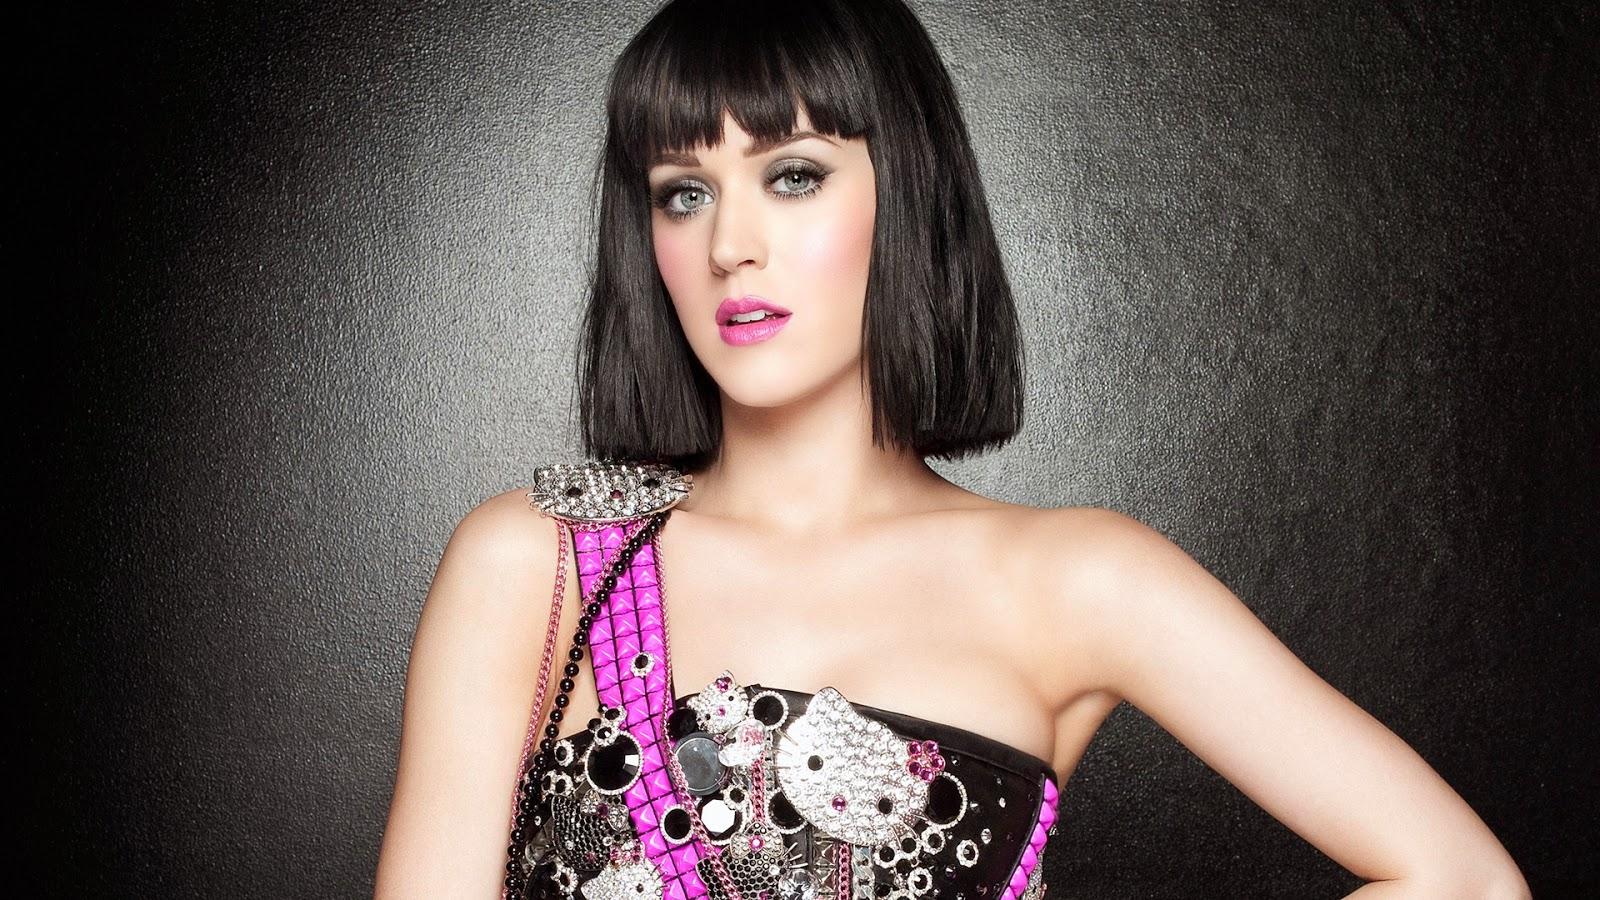 Smart Girl Wallpaper Download Katy Perry Hd Wallpaper